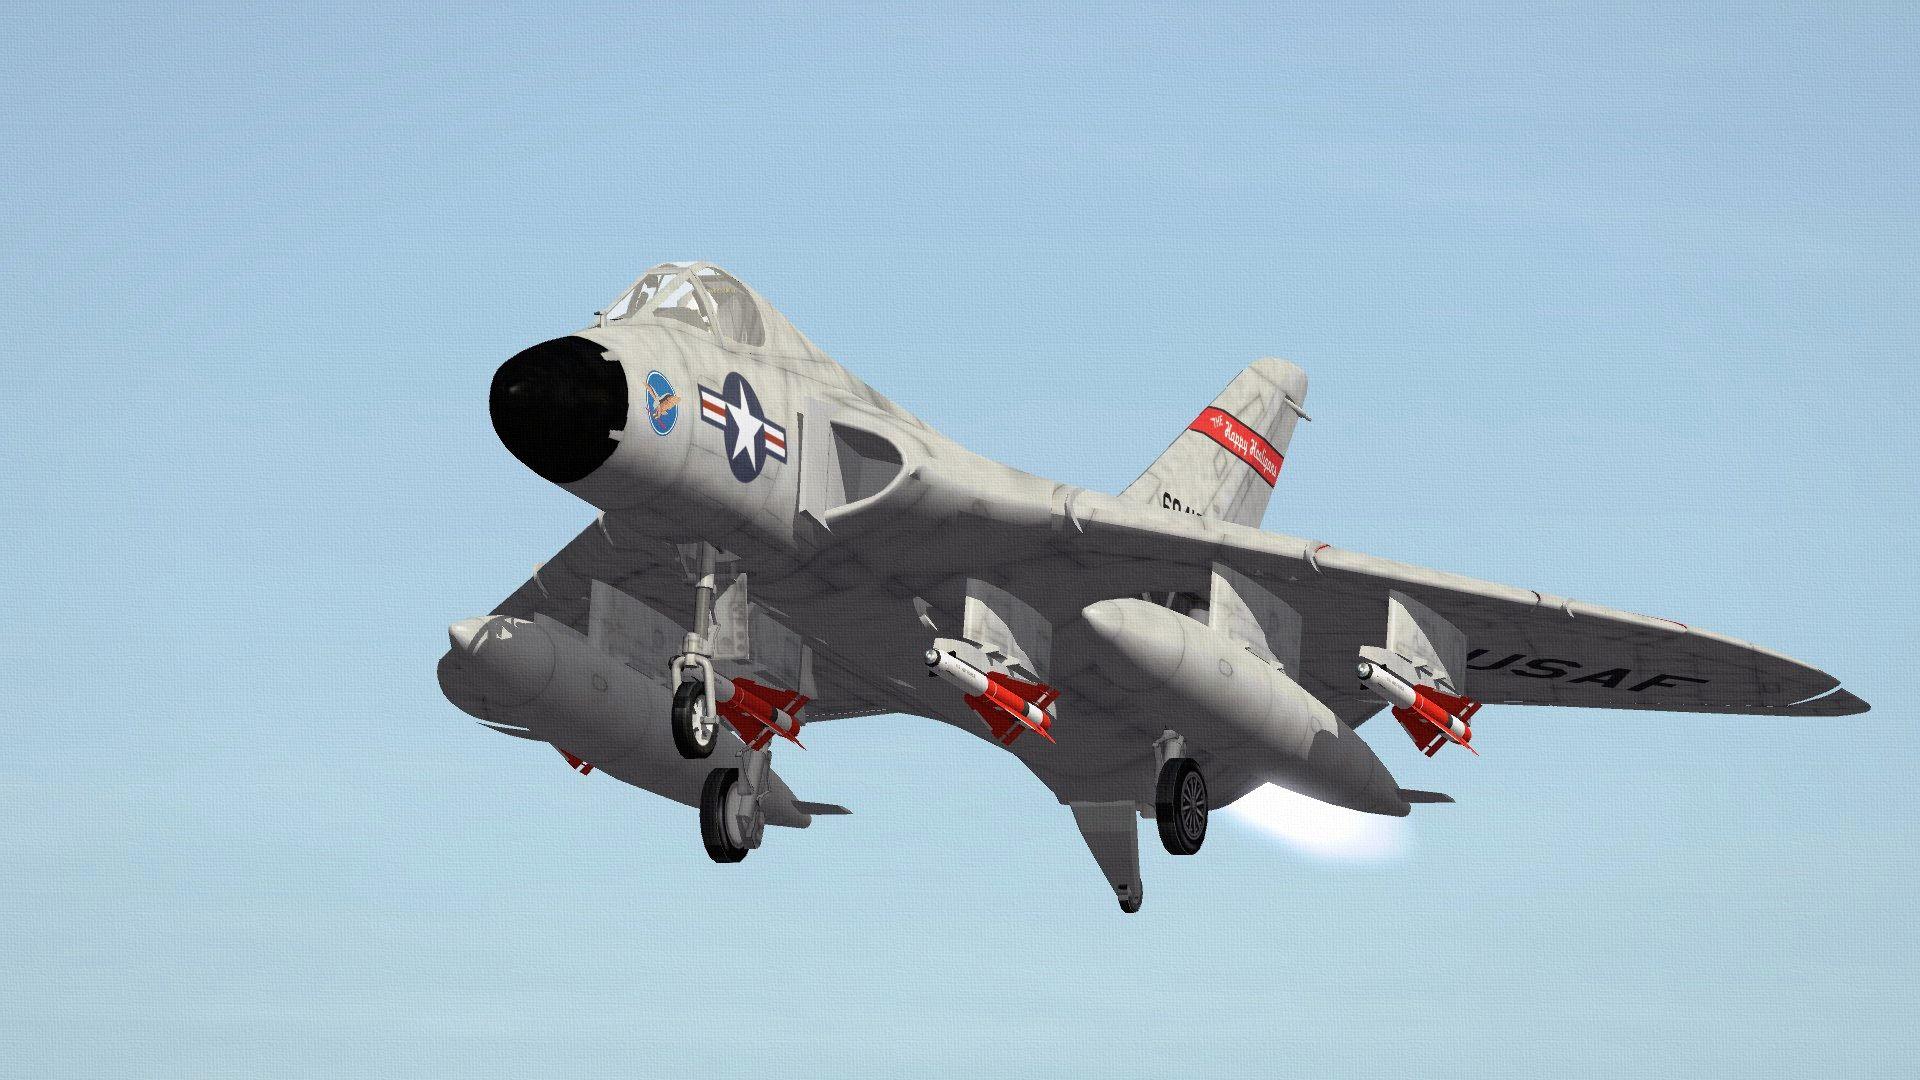 USAFF-6CSKYRAY01_zpsd6110de8.jpg